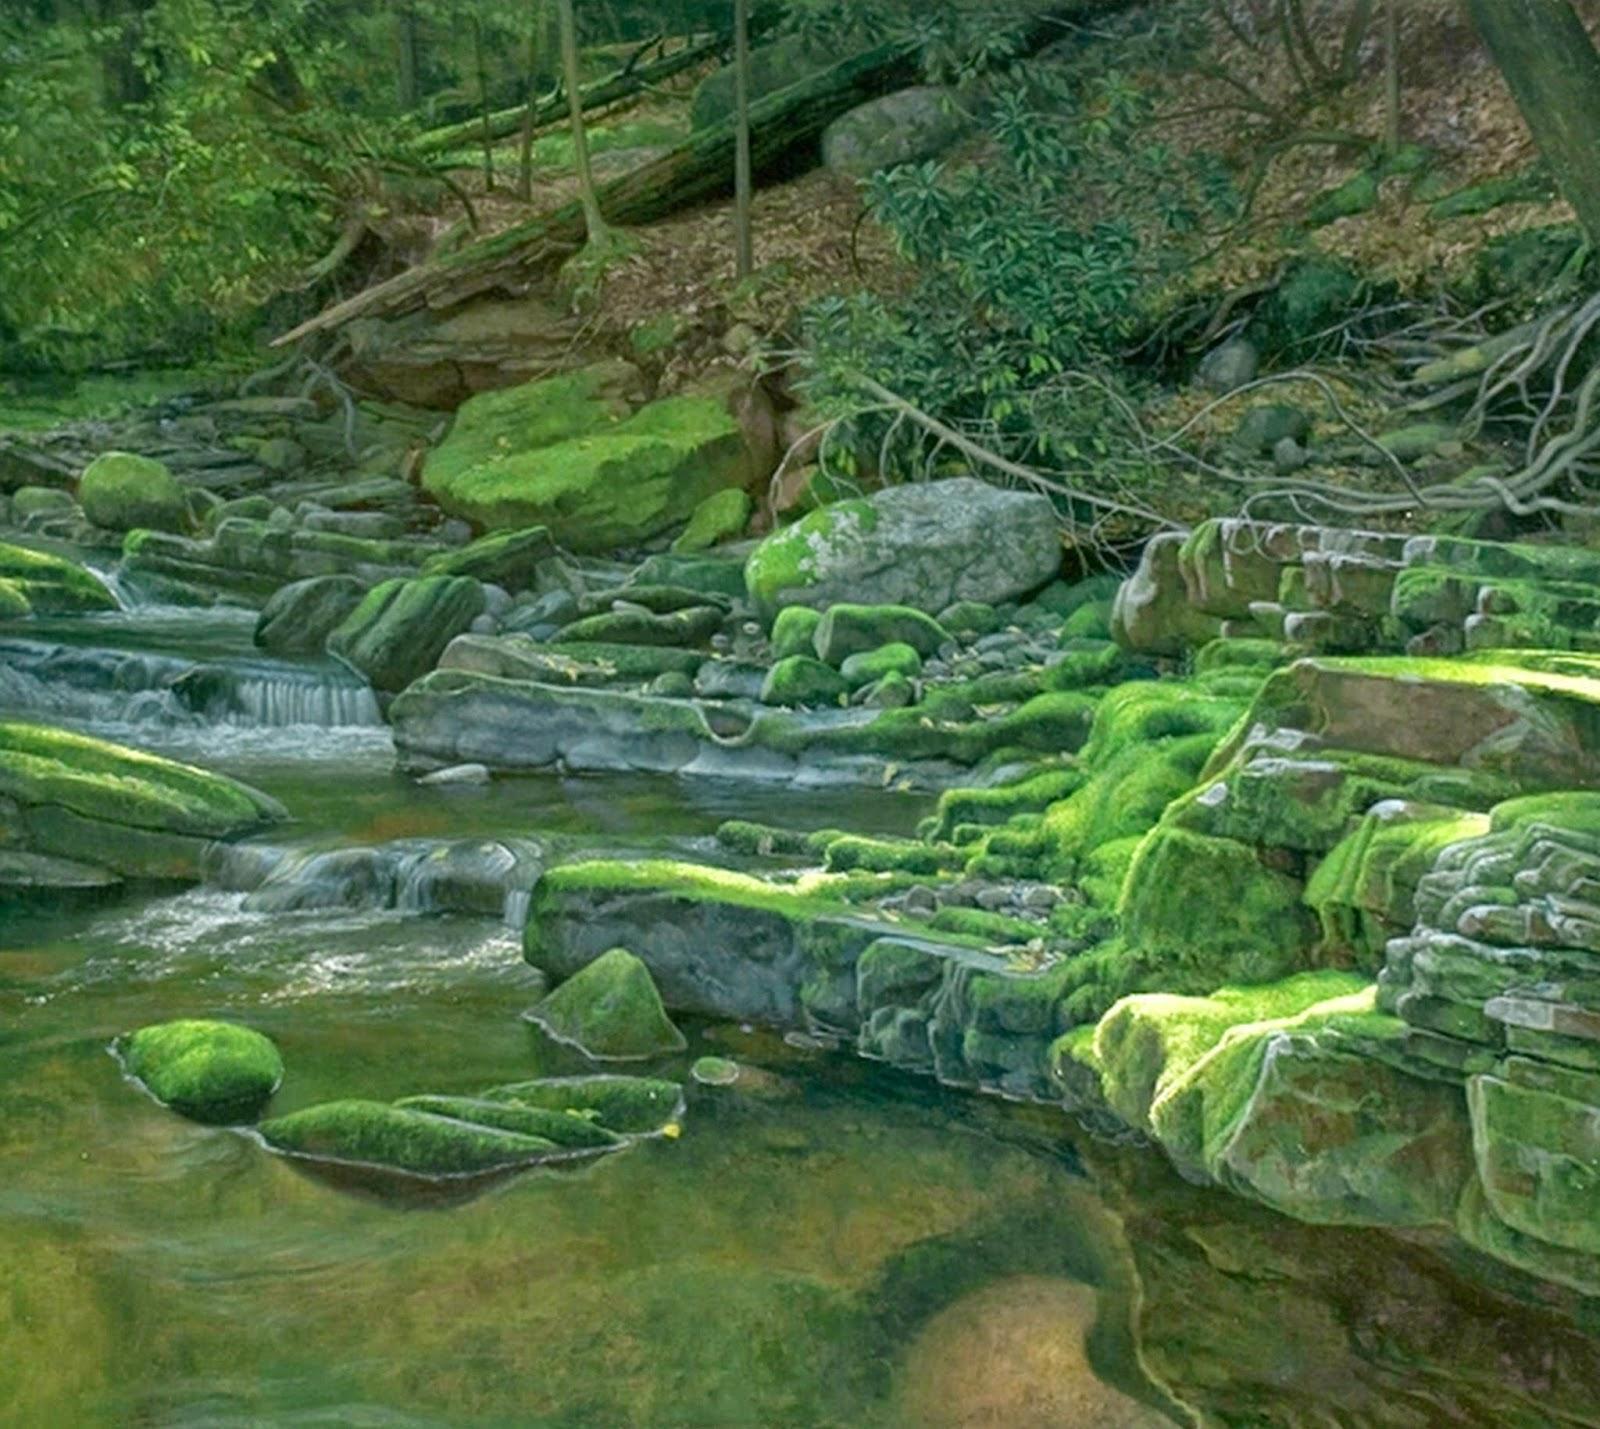 paisajes-en-hiperrealismo-al-oleo